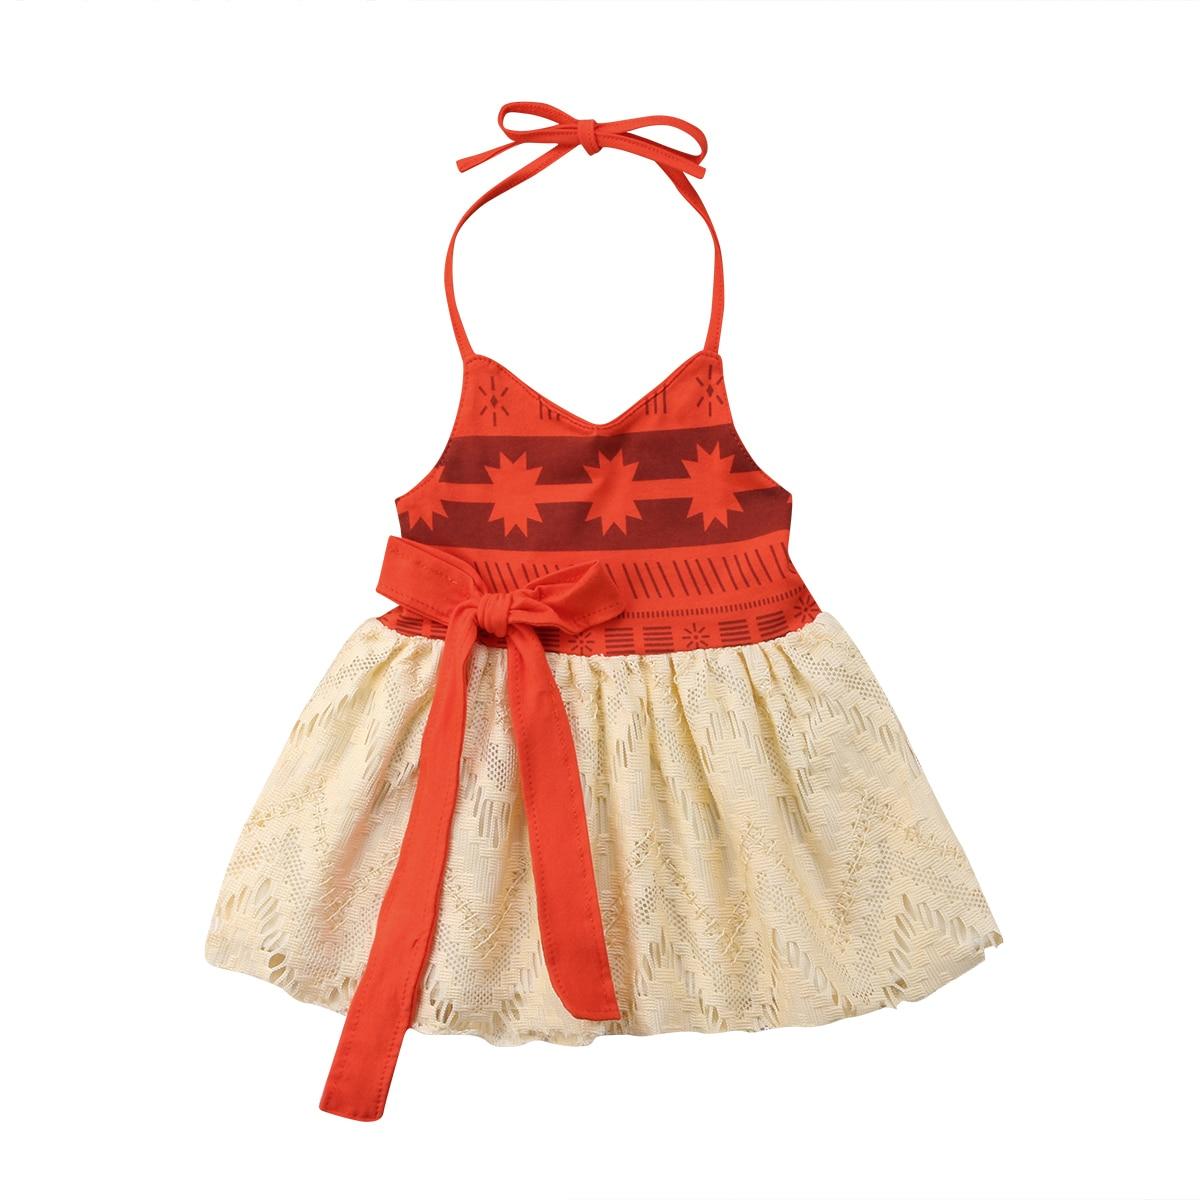 Princess Newborn Toddler Kids Baby Girl Moana Dress Summer Sleeveless Backless Strap Tutu Bow Beach Dress Sundress Baby Clothing